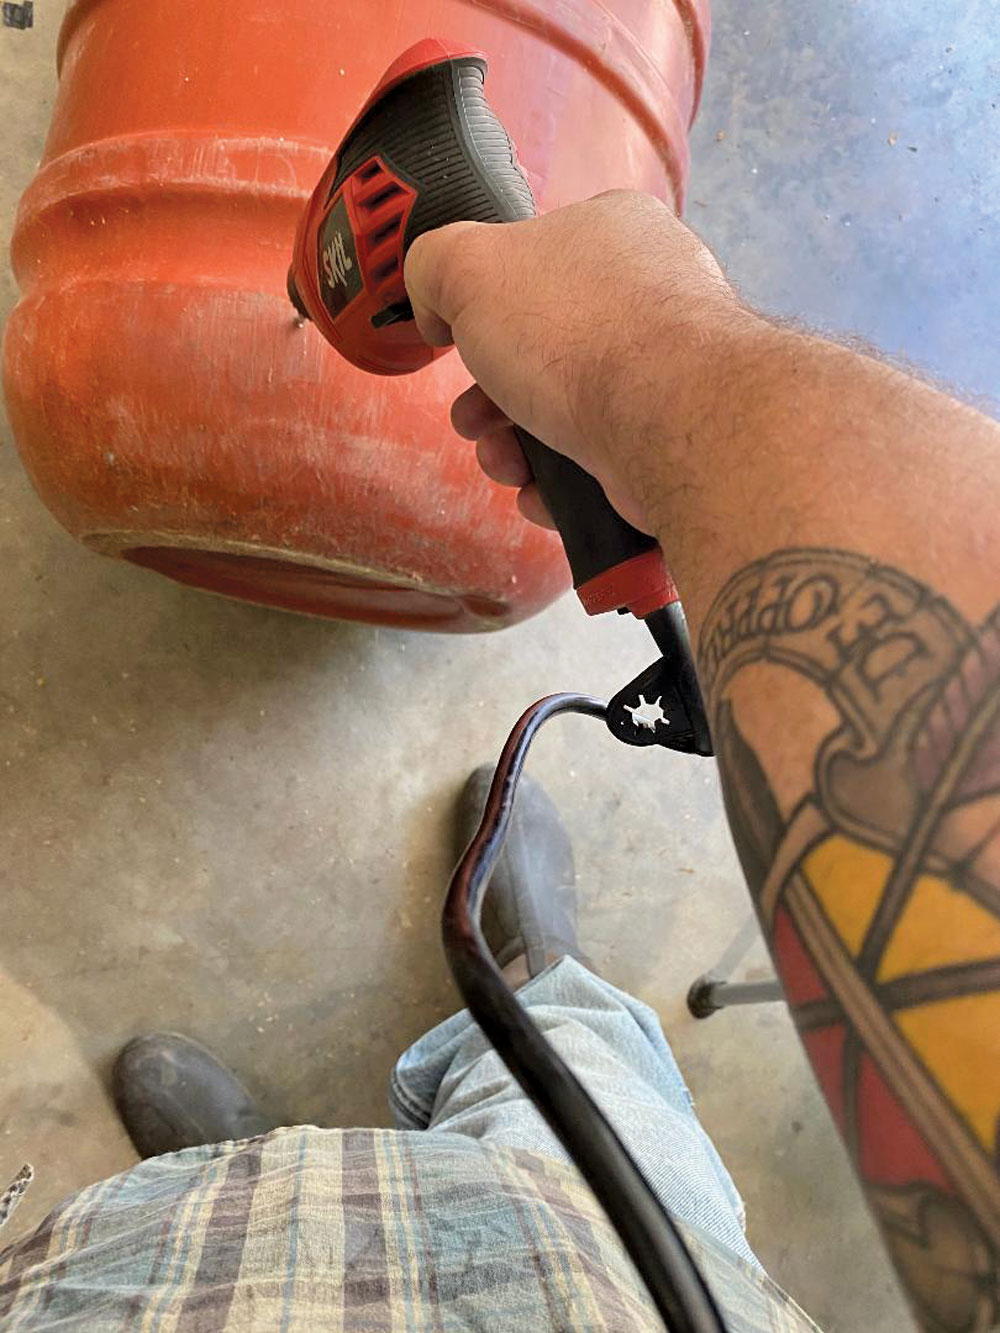 Drill a hole near the base of the rain barrel.